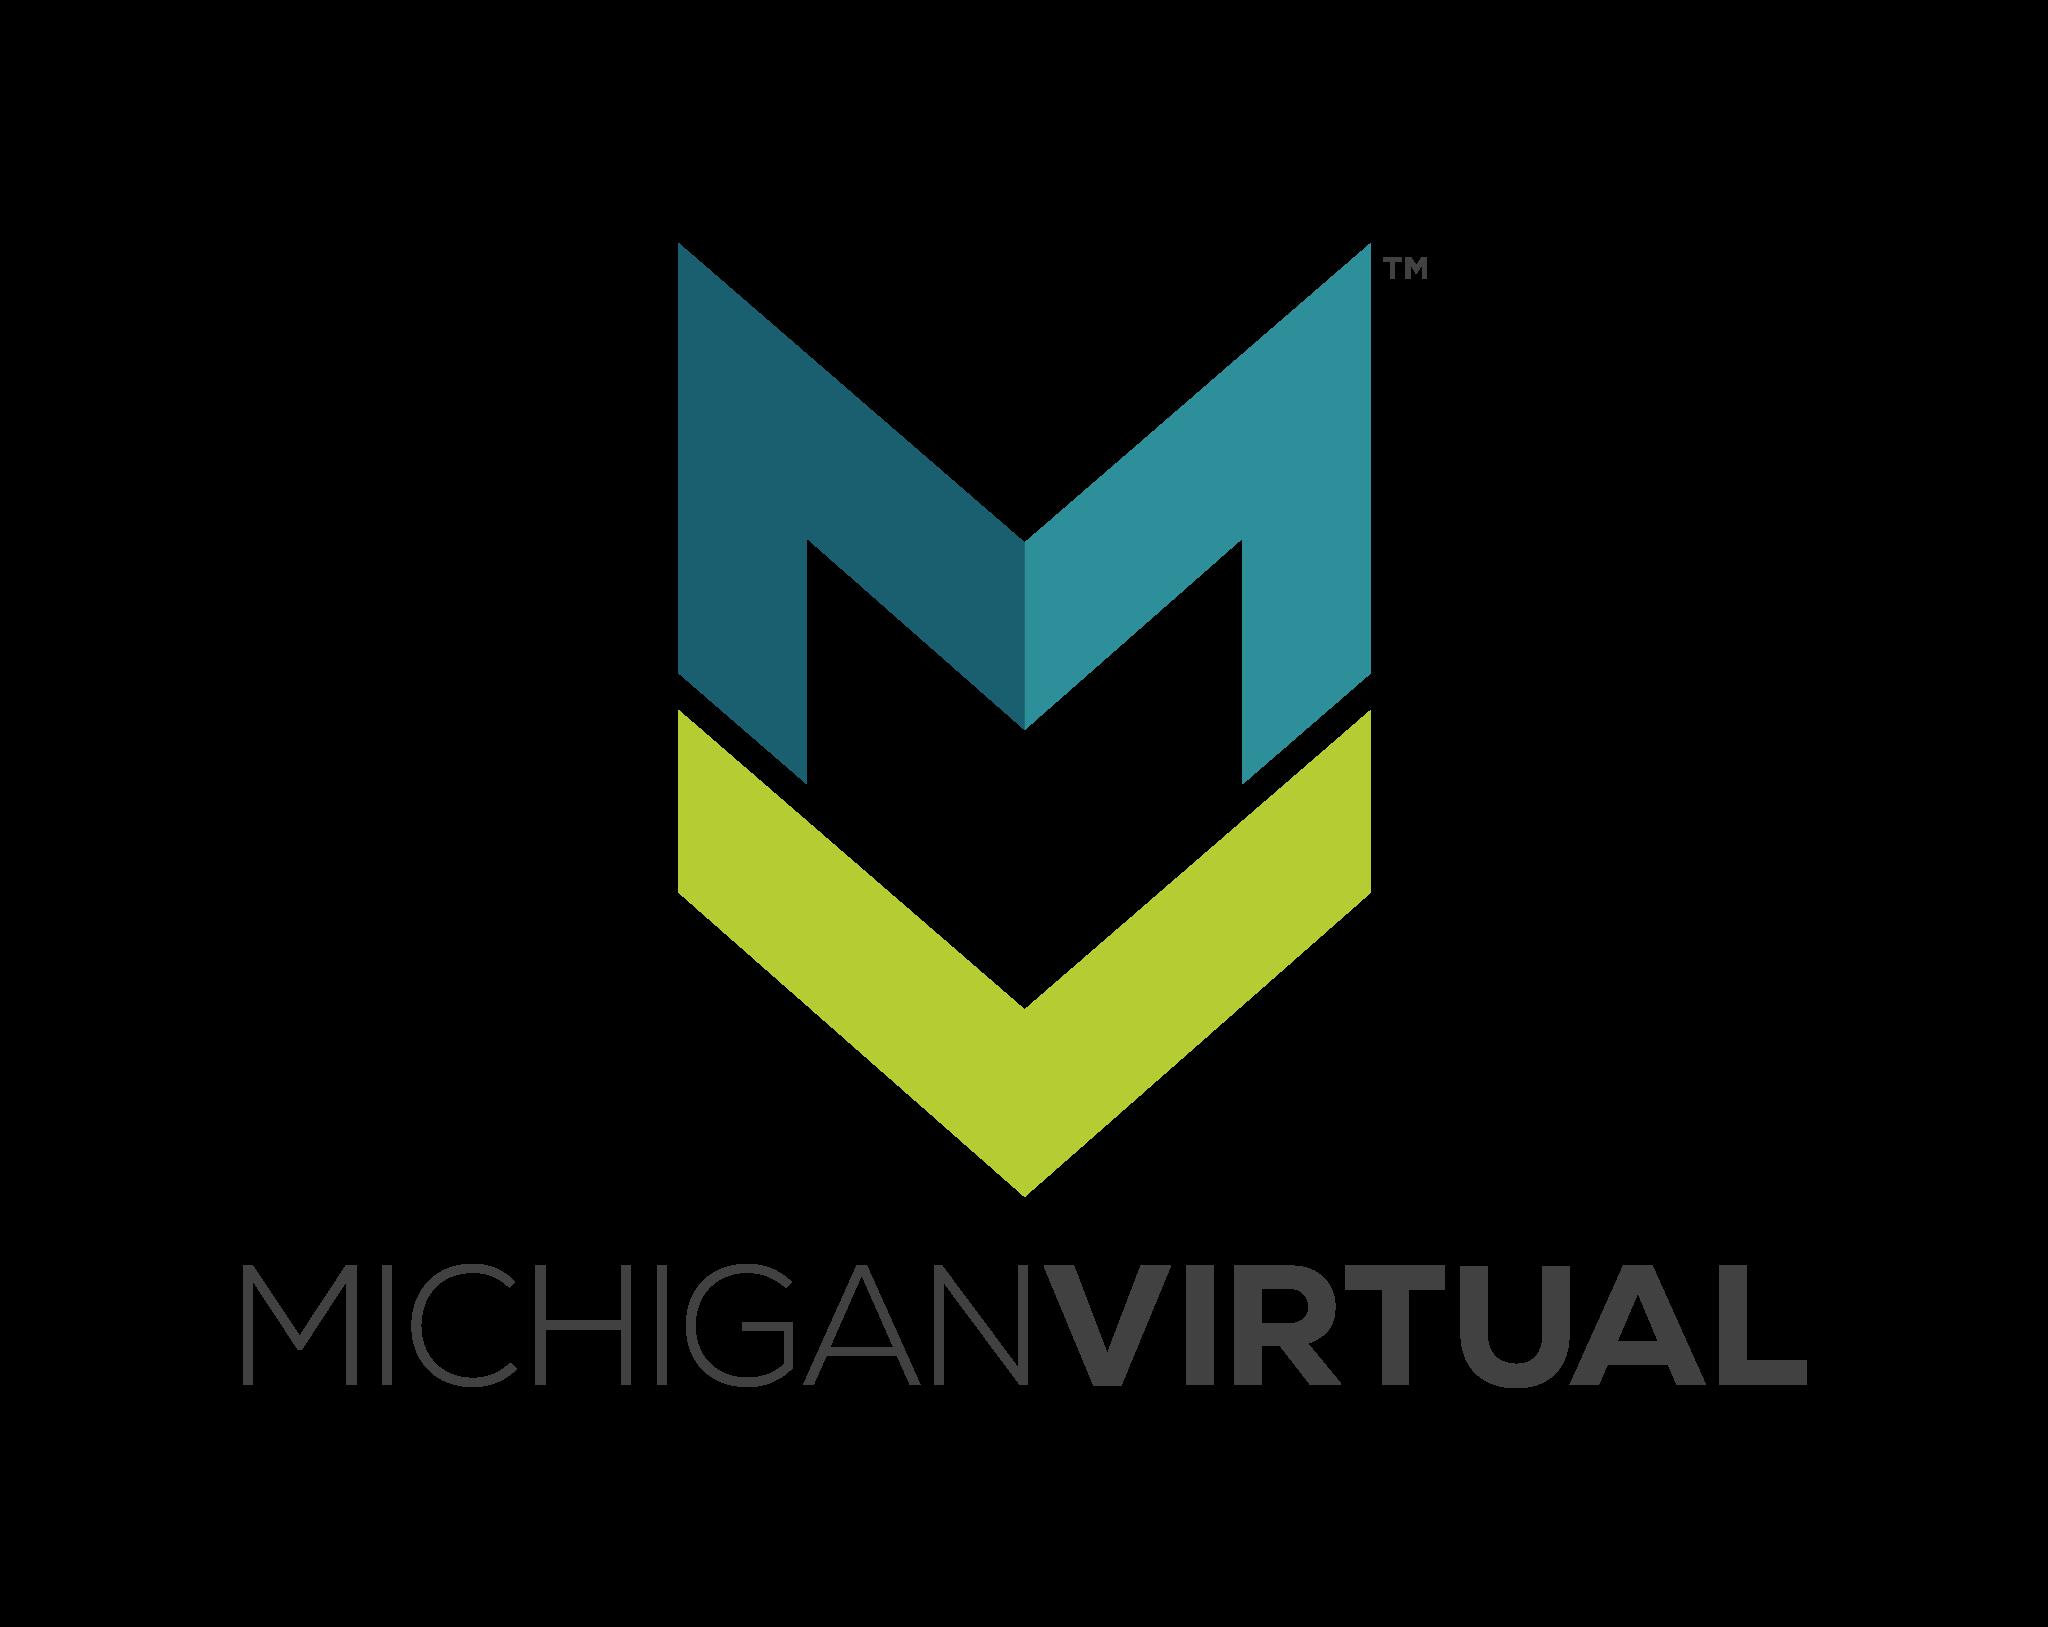 Michigan Virtual Logo (Vertical)